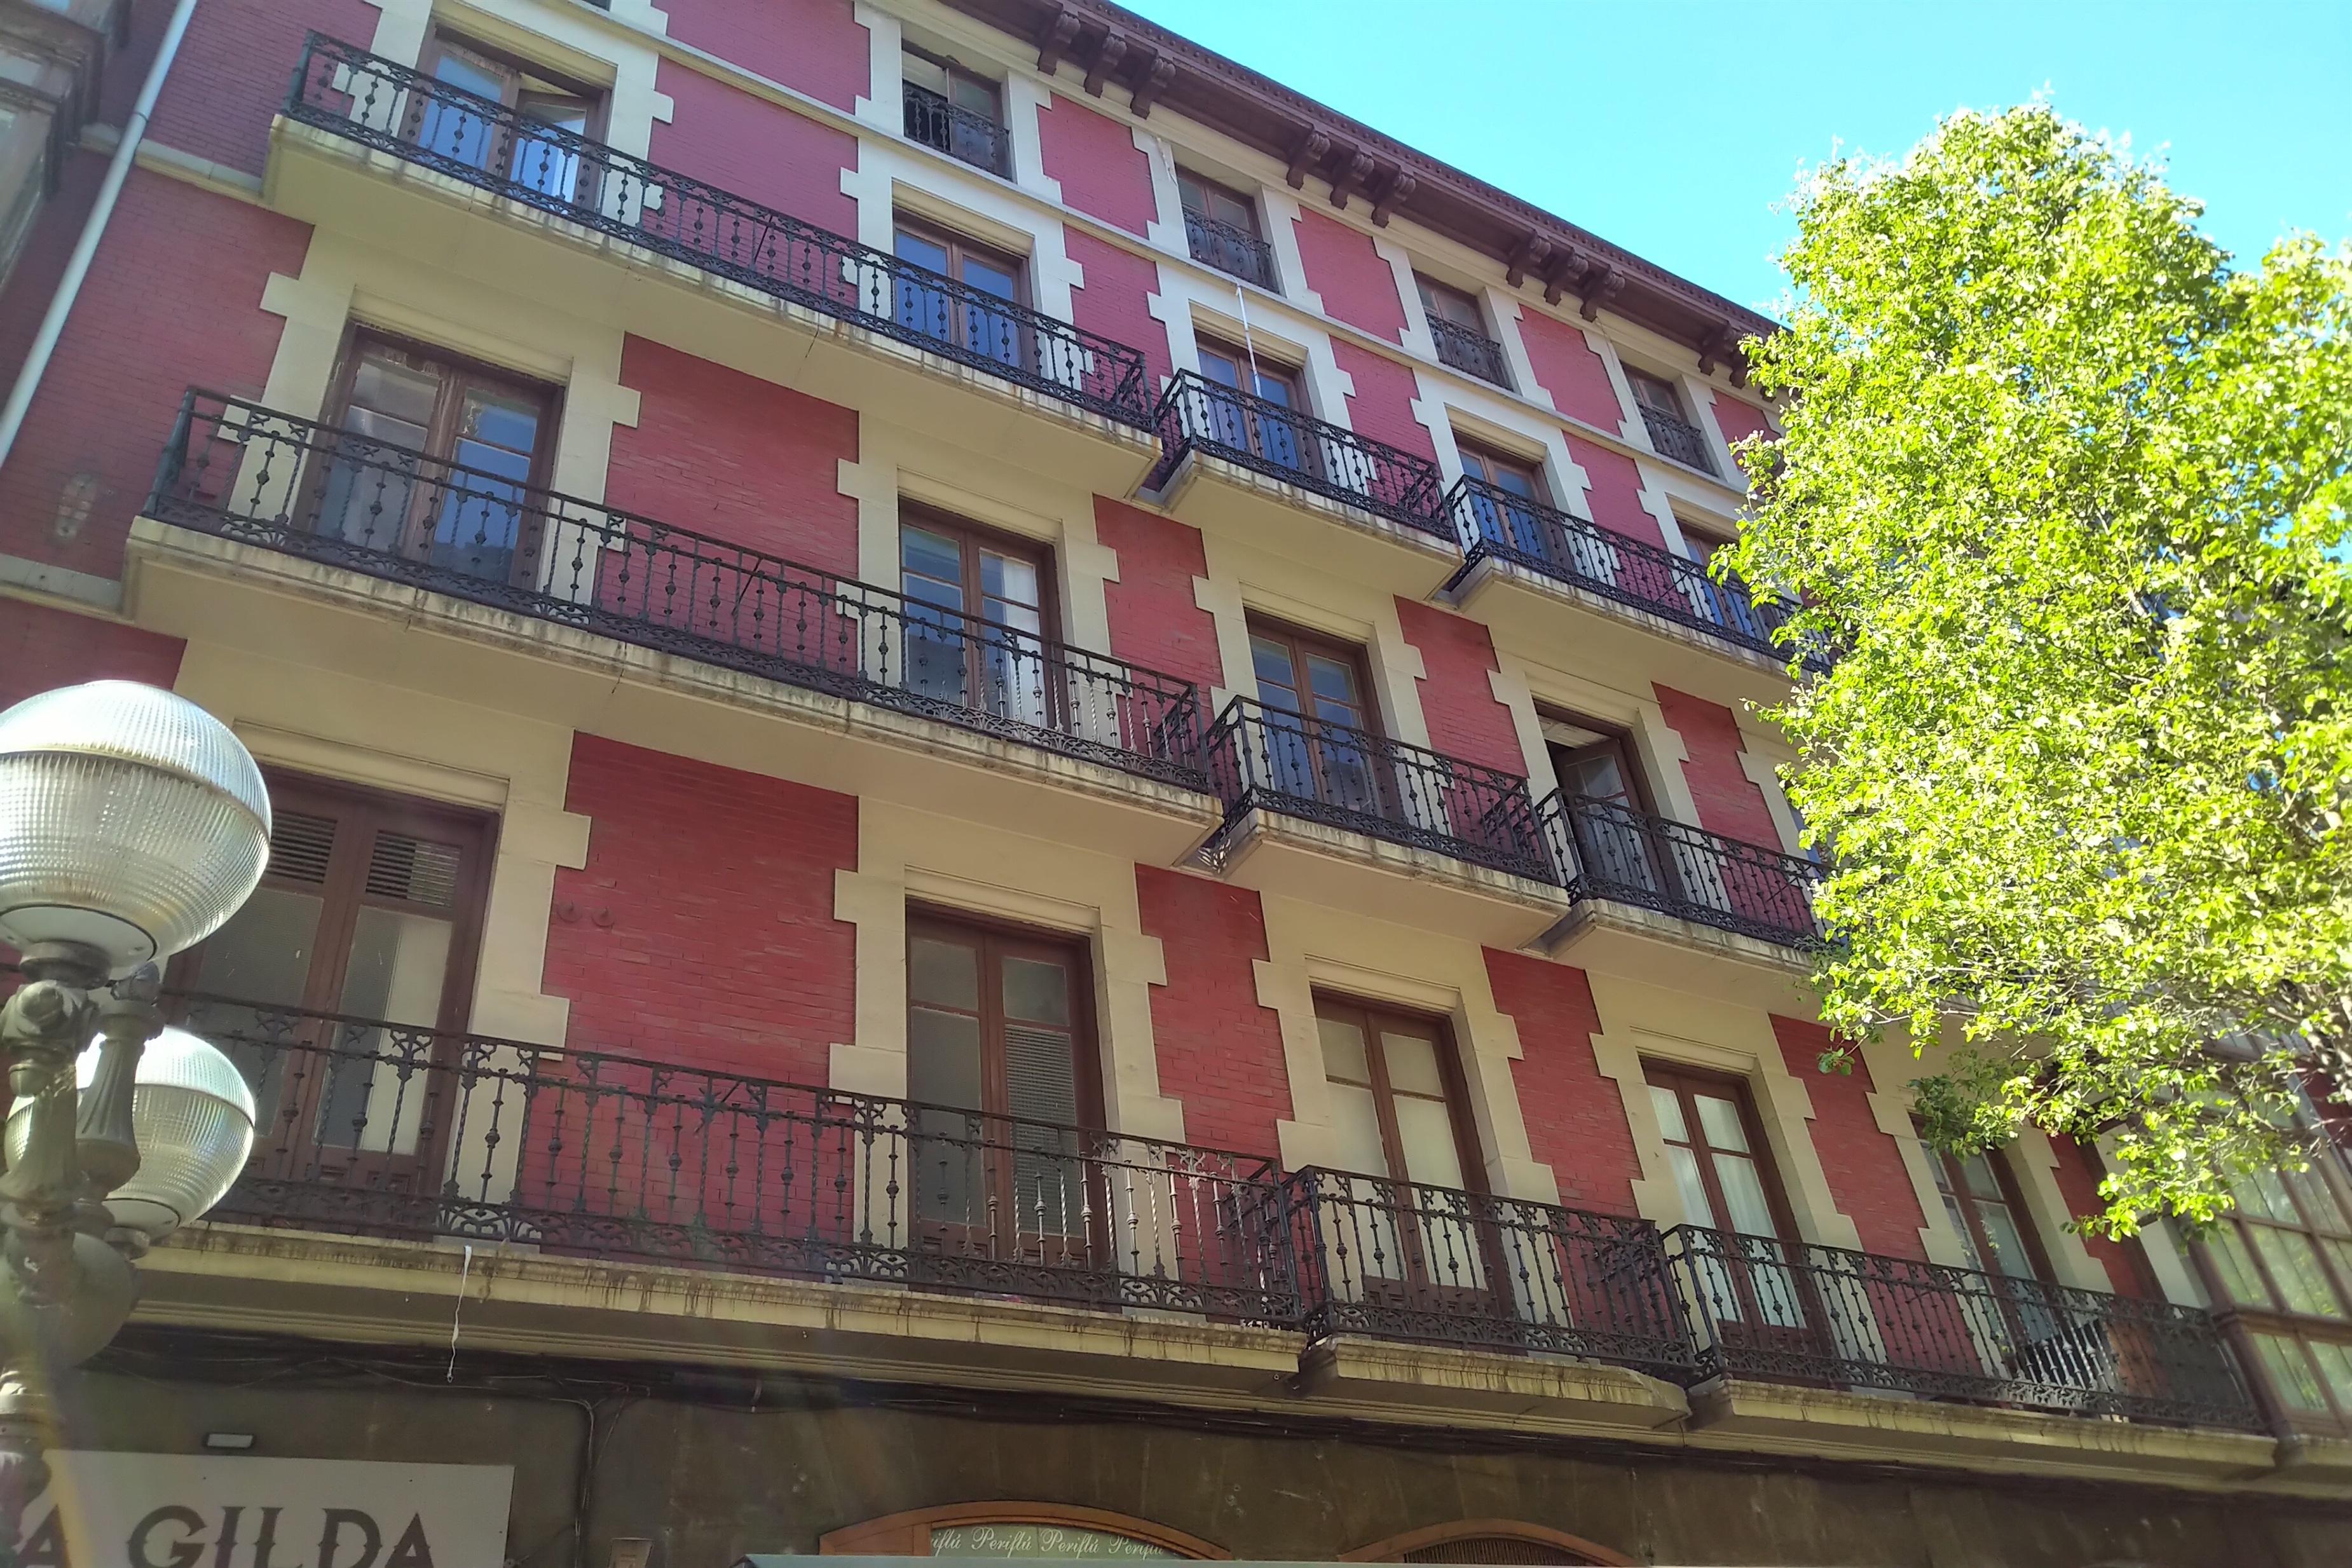 Archivo - Edificio adquirido por All Iron en Bilbao